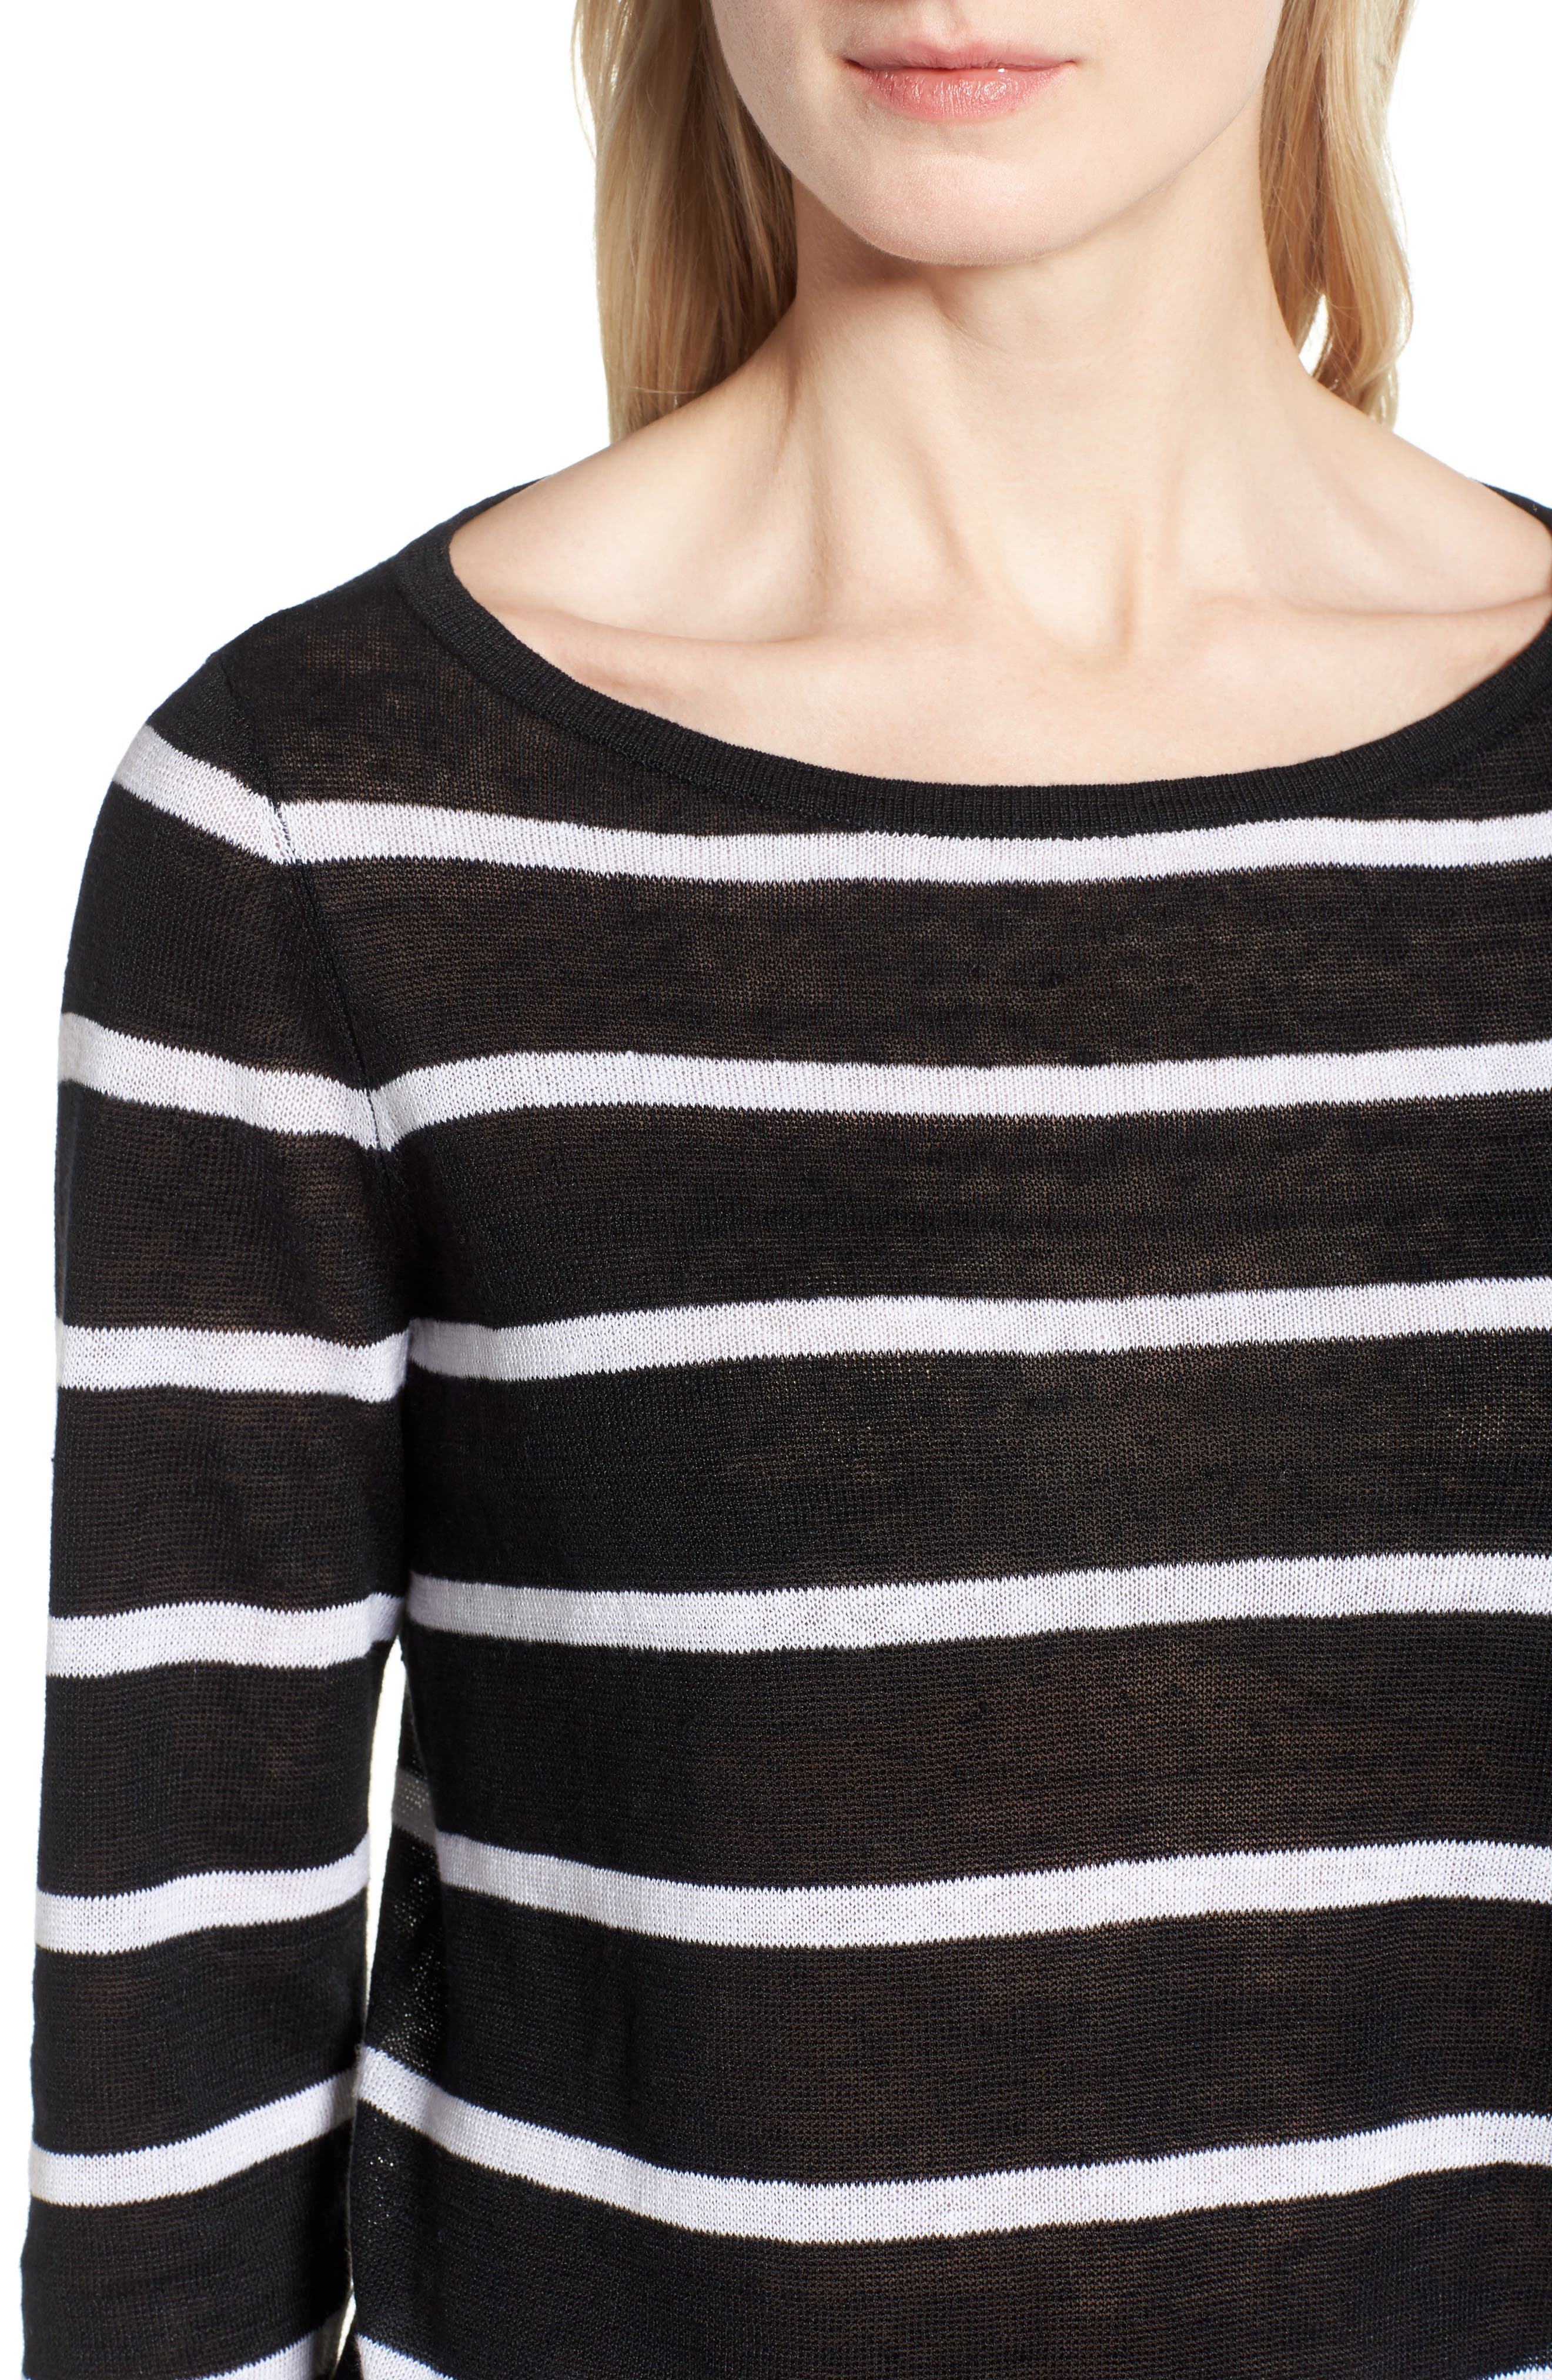 Stripe Organic Linen Sweater,                             Alternate thumbnail 4, color,                             Black/ White